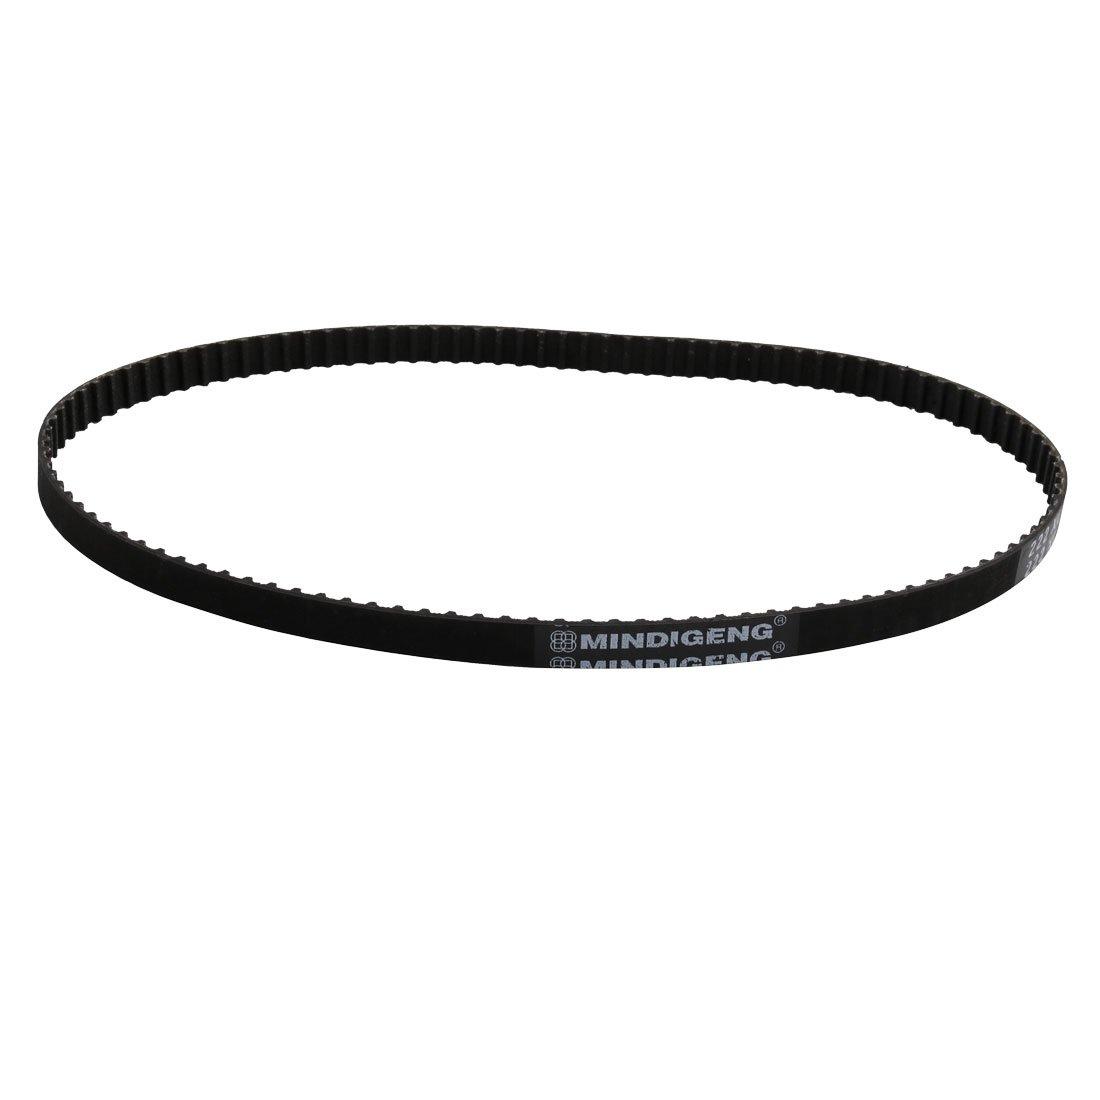 sourcingmap 222XL 111 Teeth 10mm Width Stepper Motor Rubber Timing Belt Black 1pcs